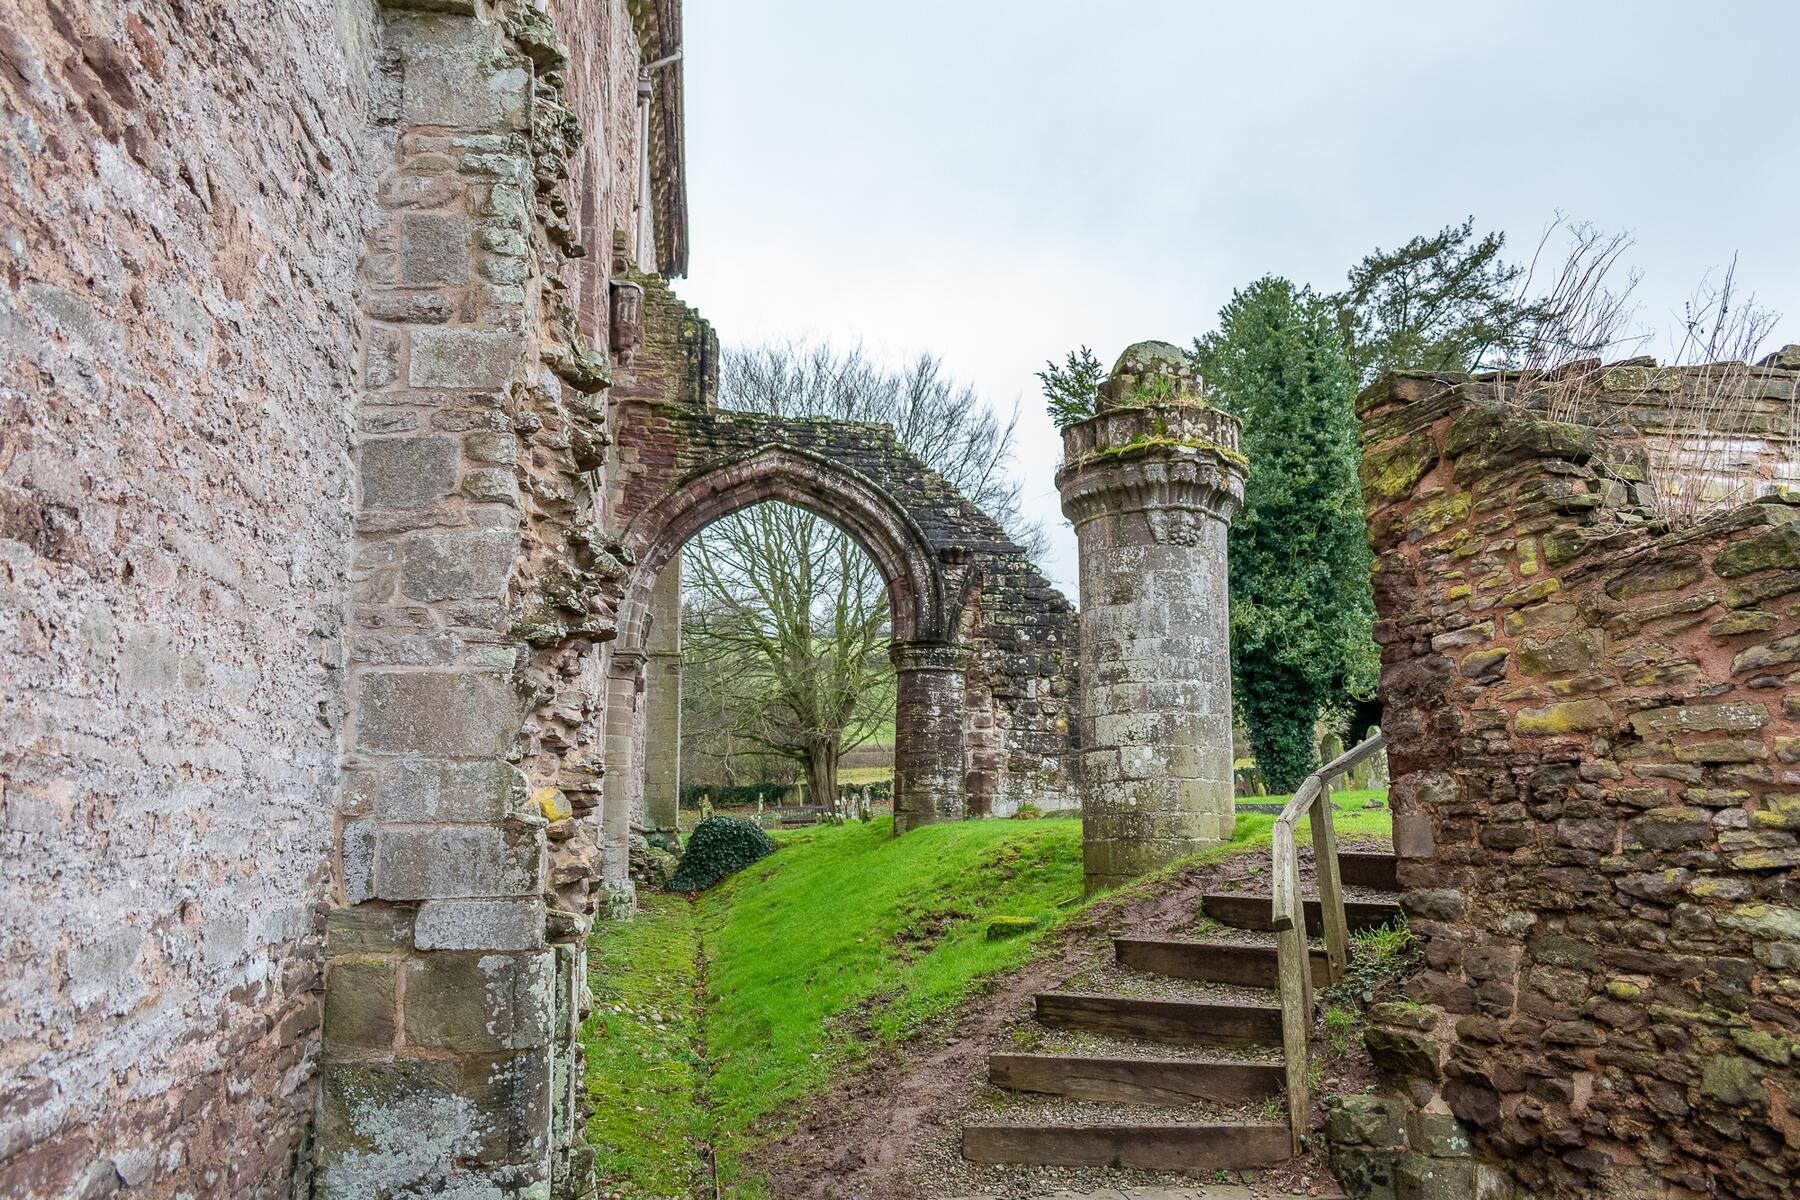 ruins at dore abbey